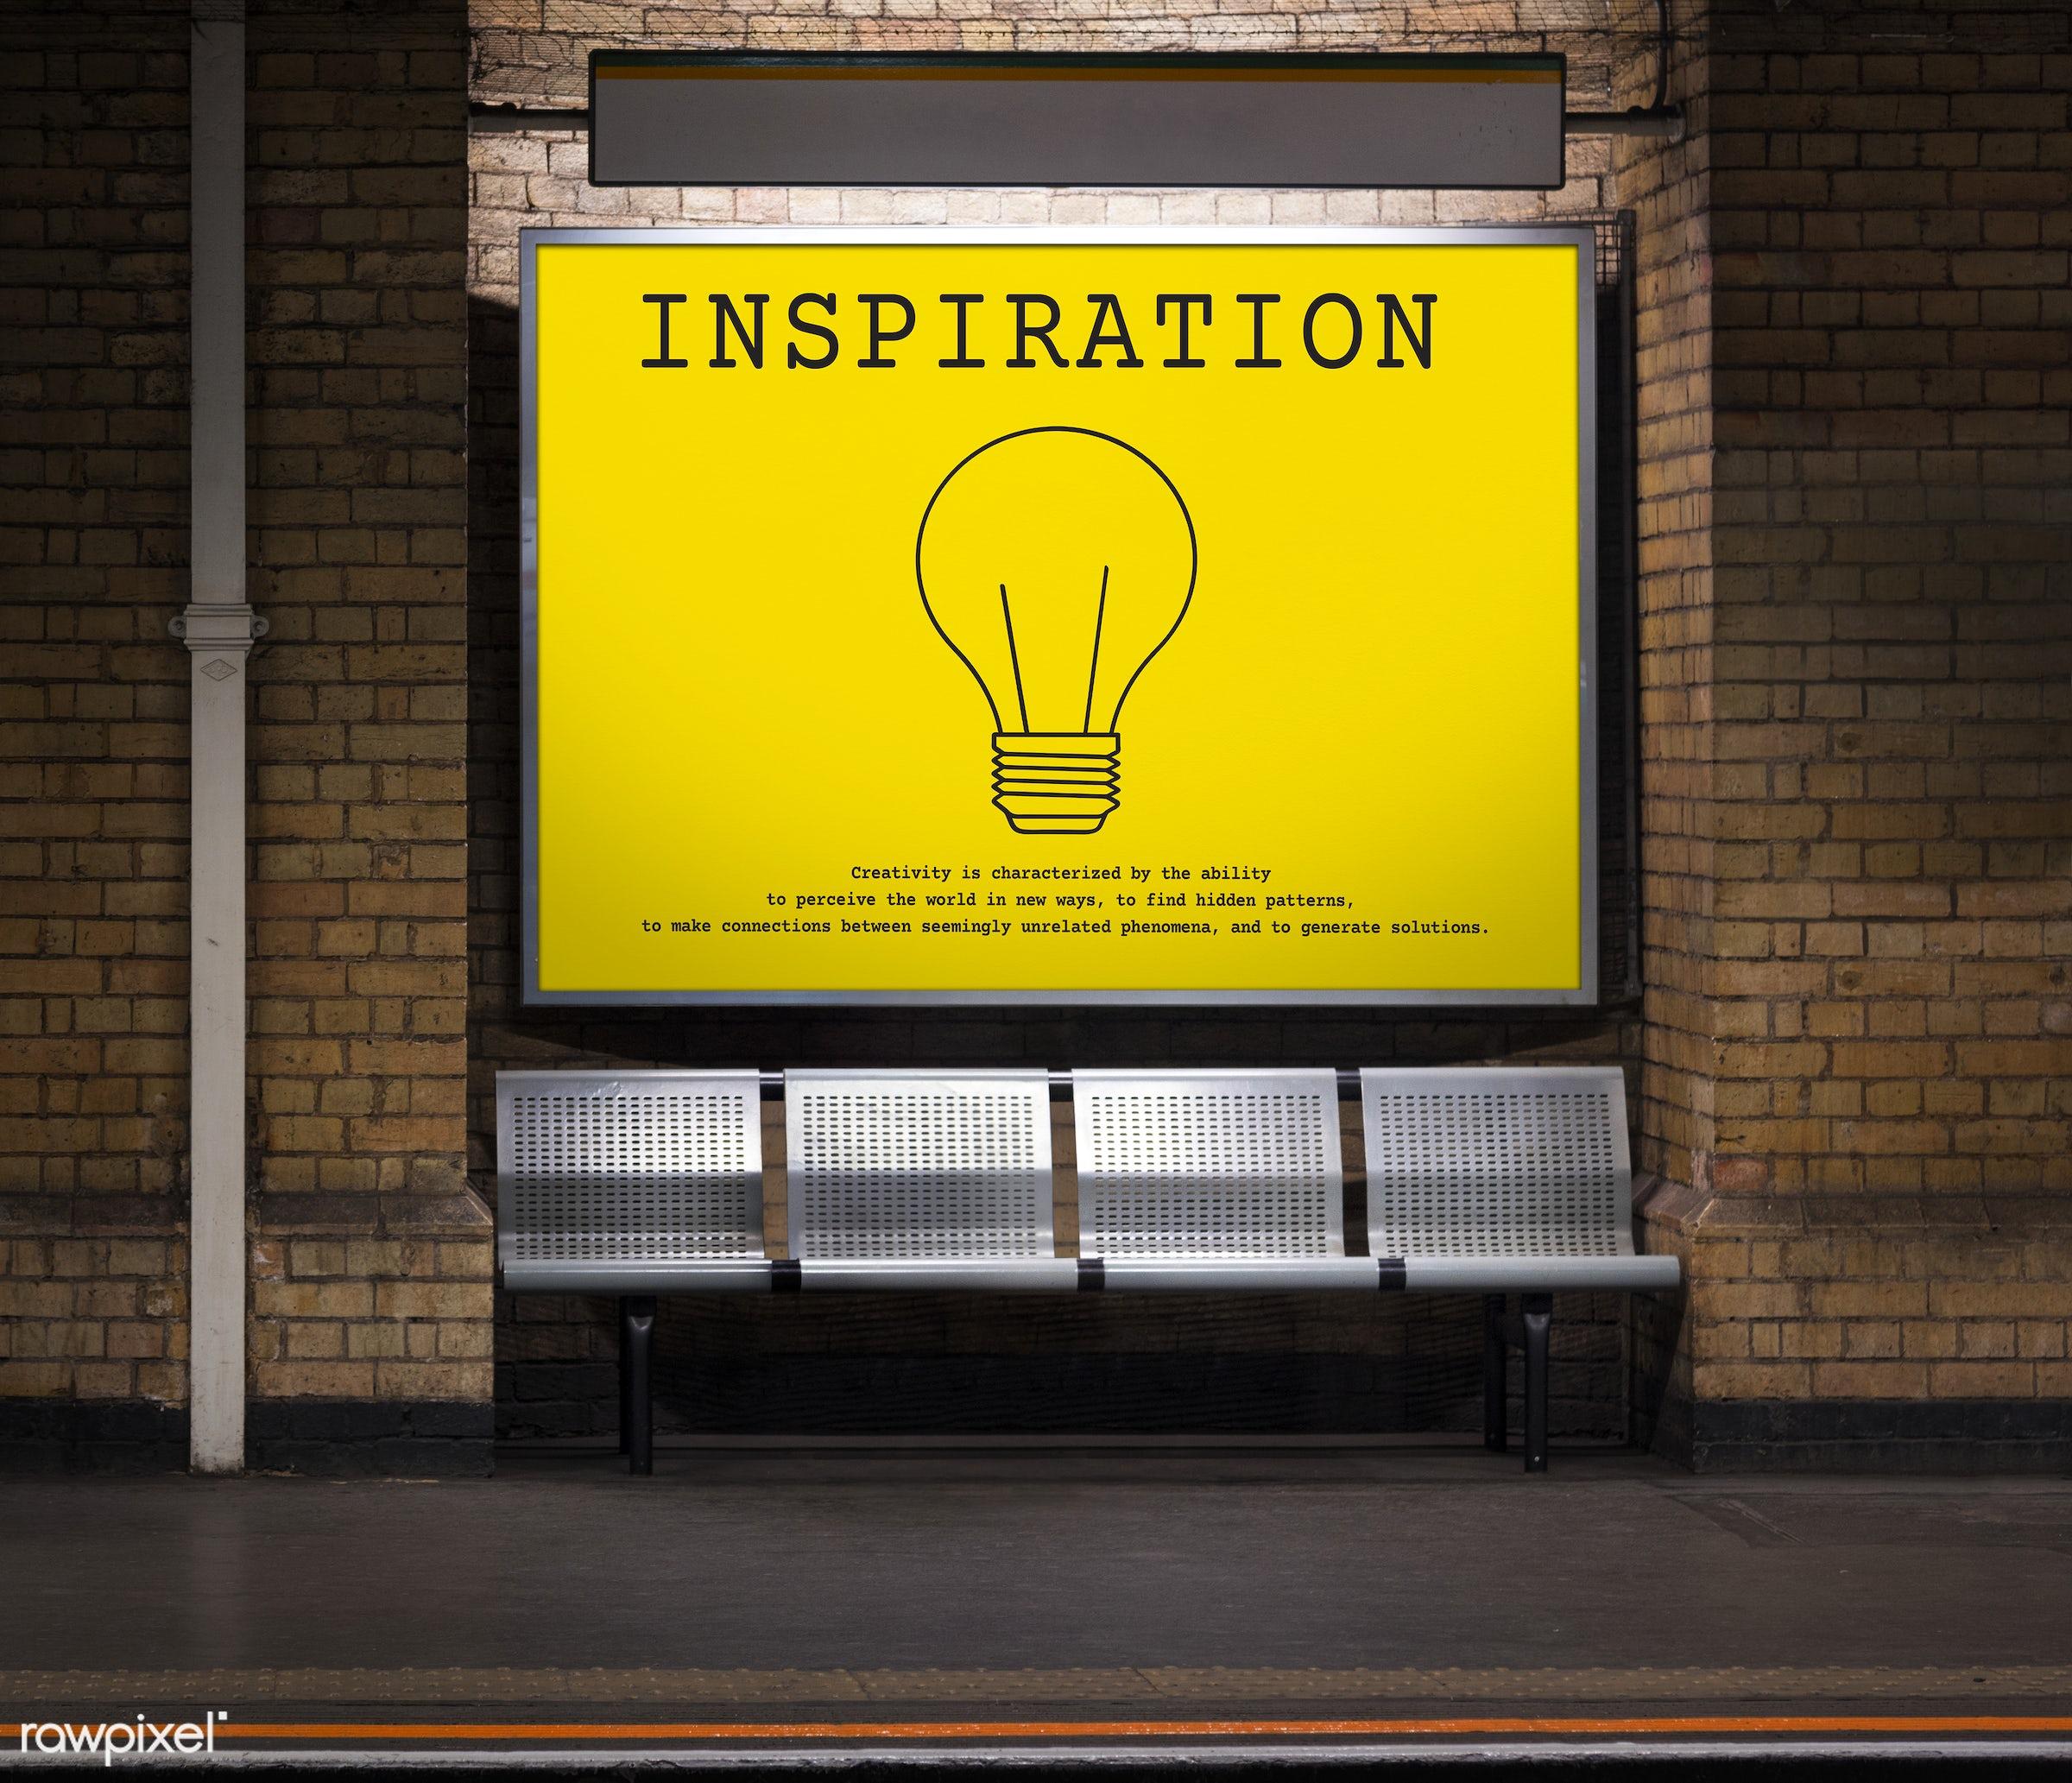 Advertisement in an underground train station - be inspired, bricks, brickswall, bulb, concept, creative, creativity, design...